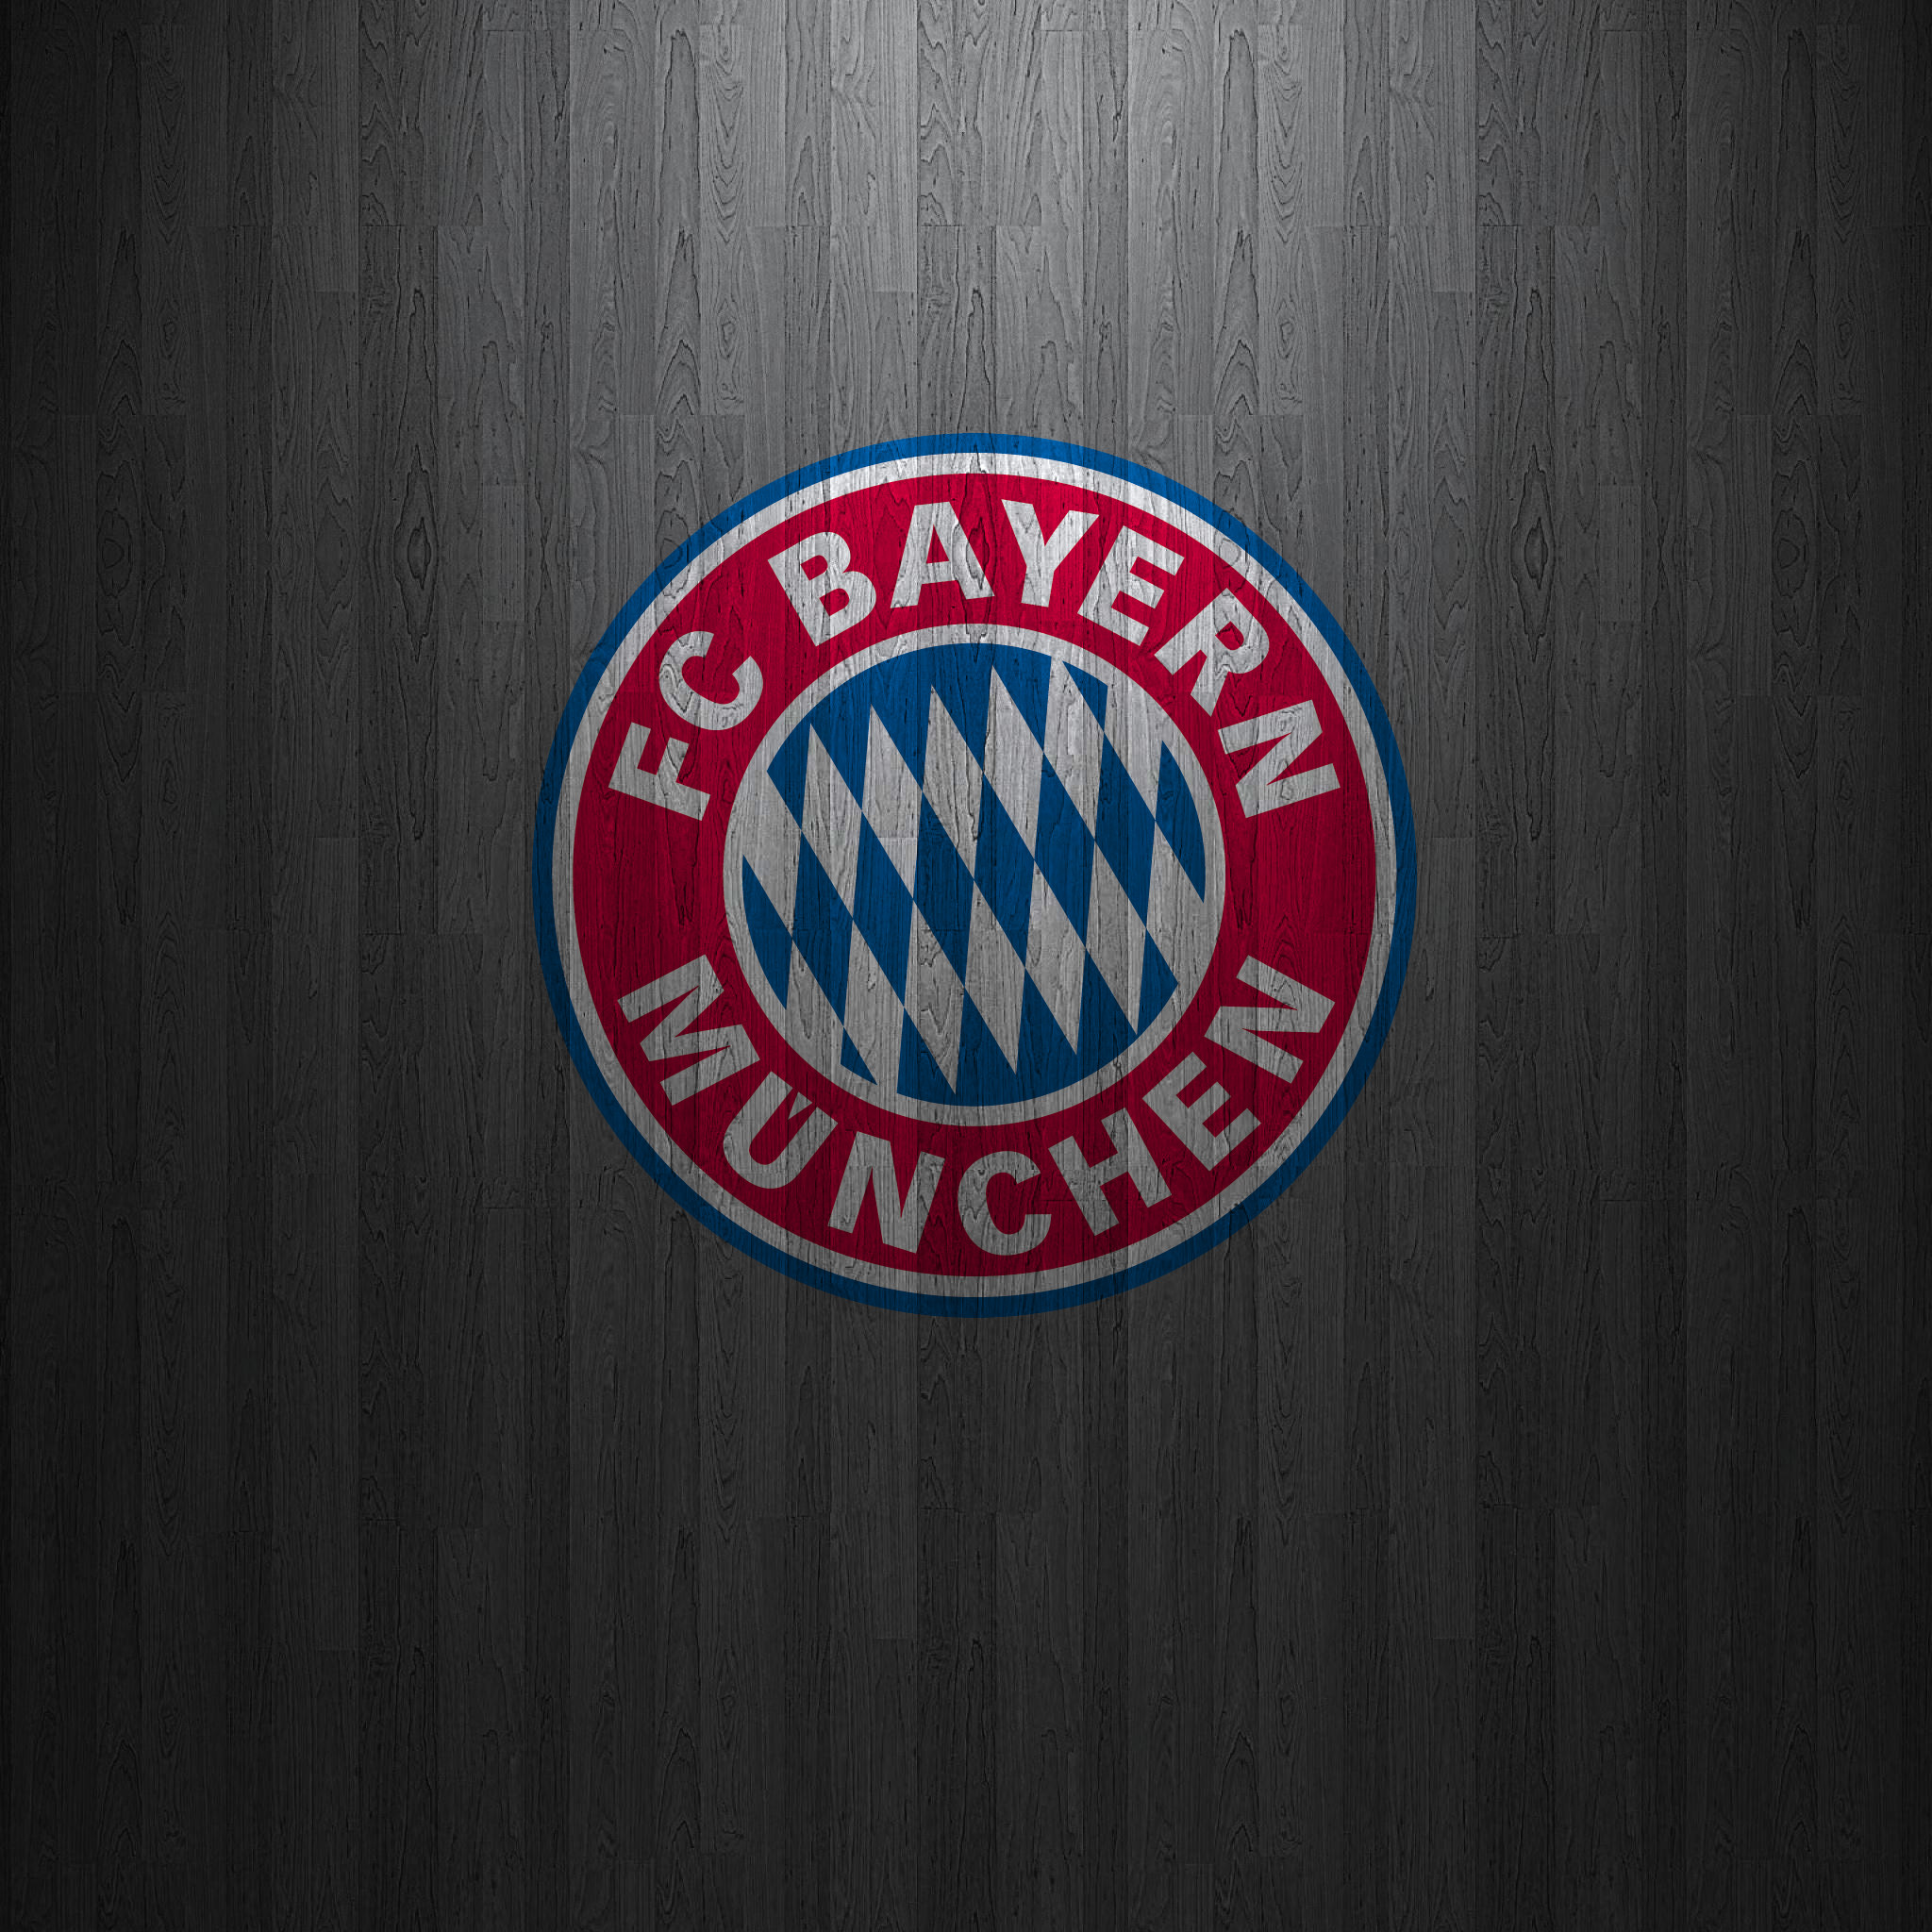 New England Patriots Iphone X Wallpaper Die 75 Besten Fc Bayern Wallpapers